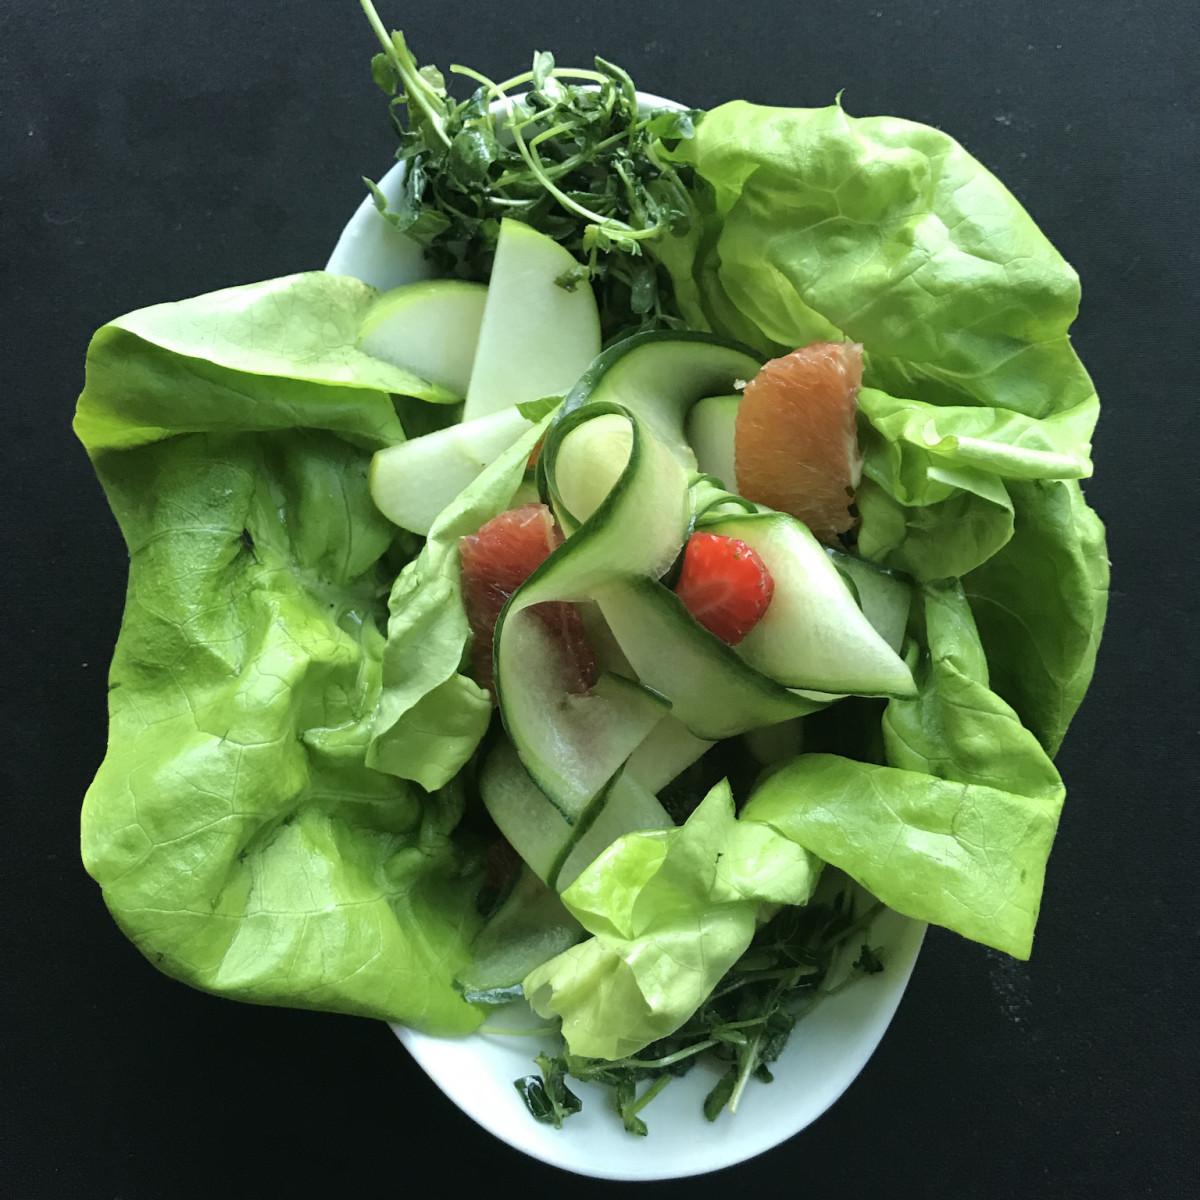 Harold's salad royale